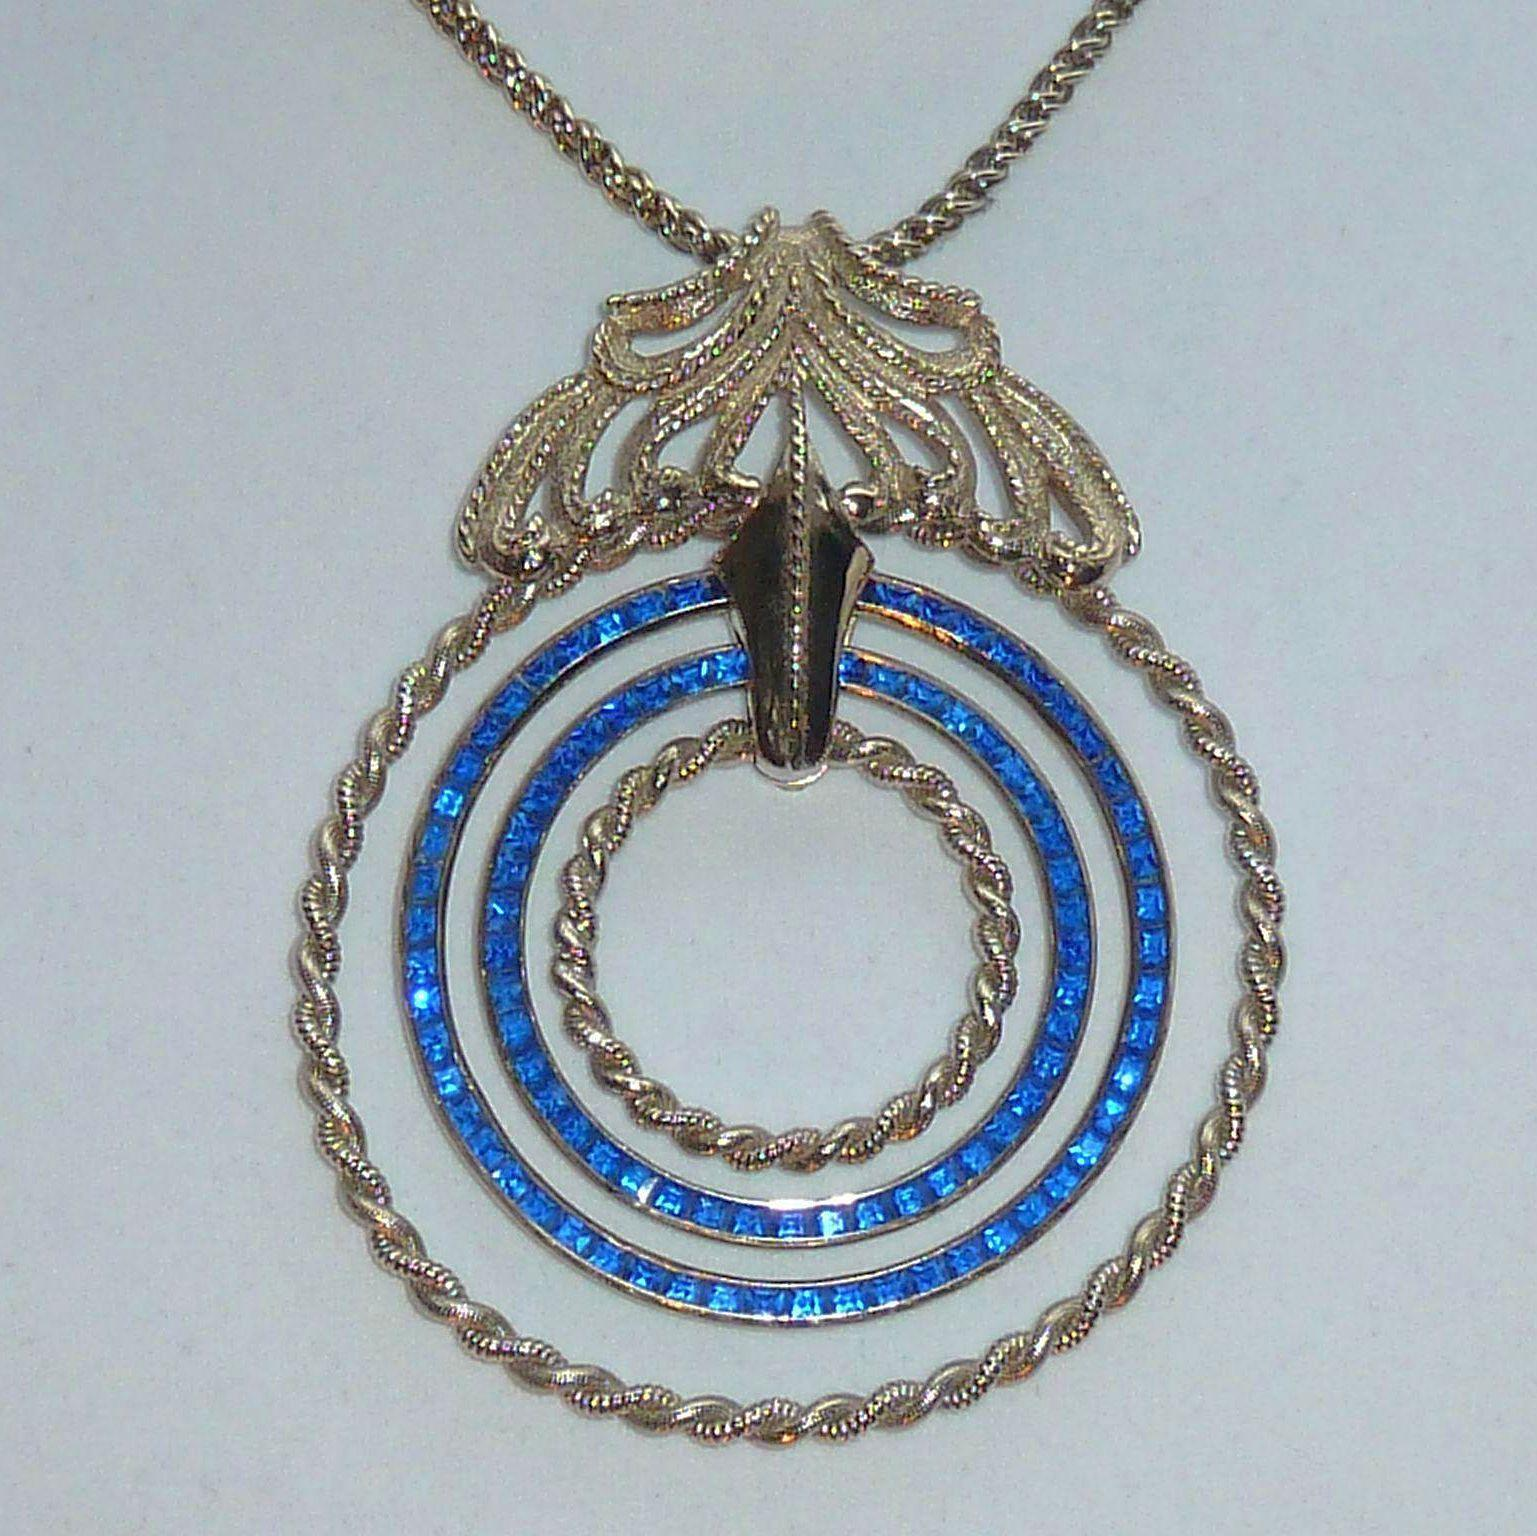 Lucien Piccard Large Blue Rhinestone Vintage Necklace